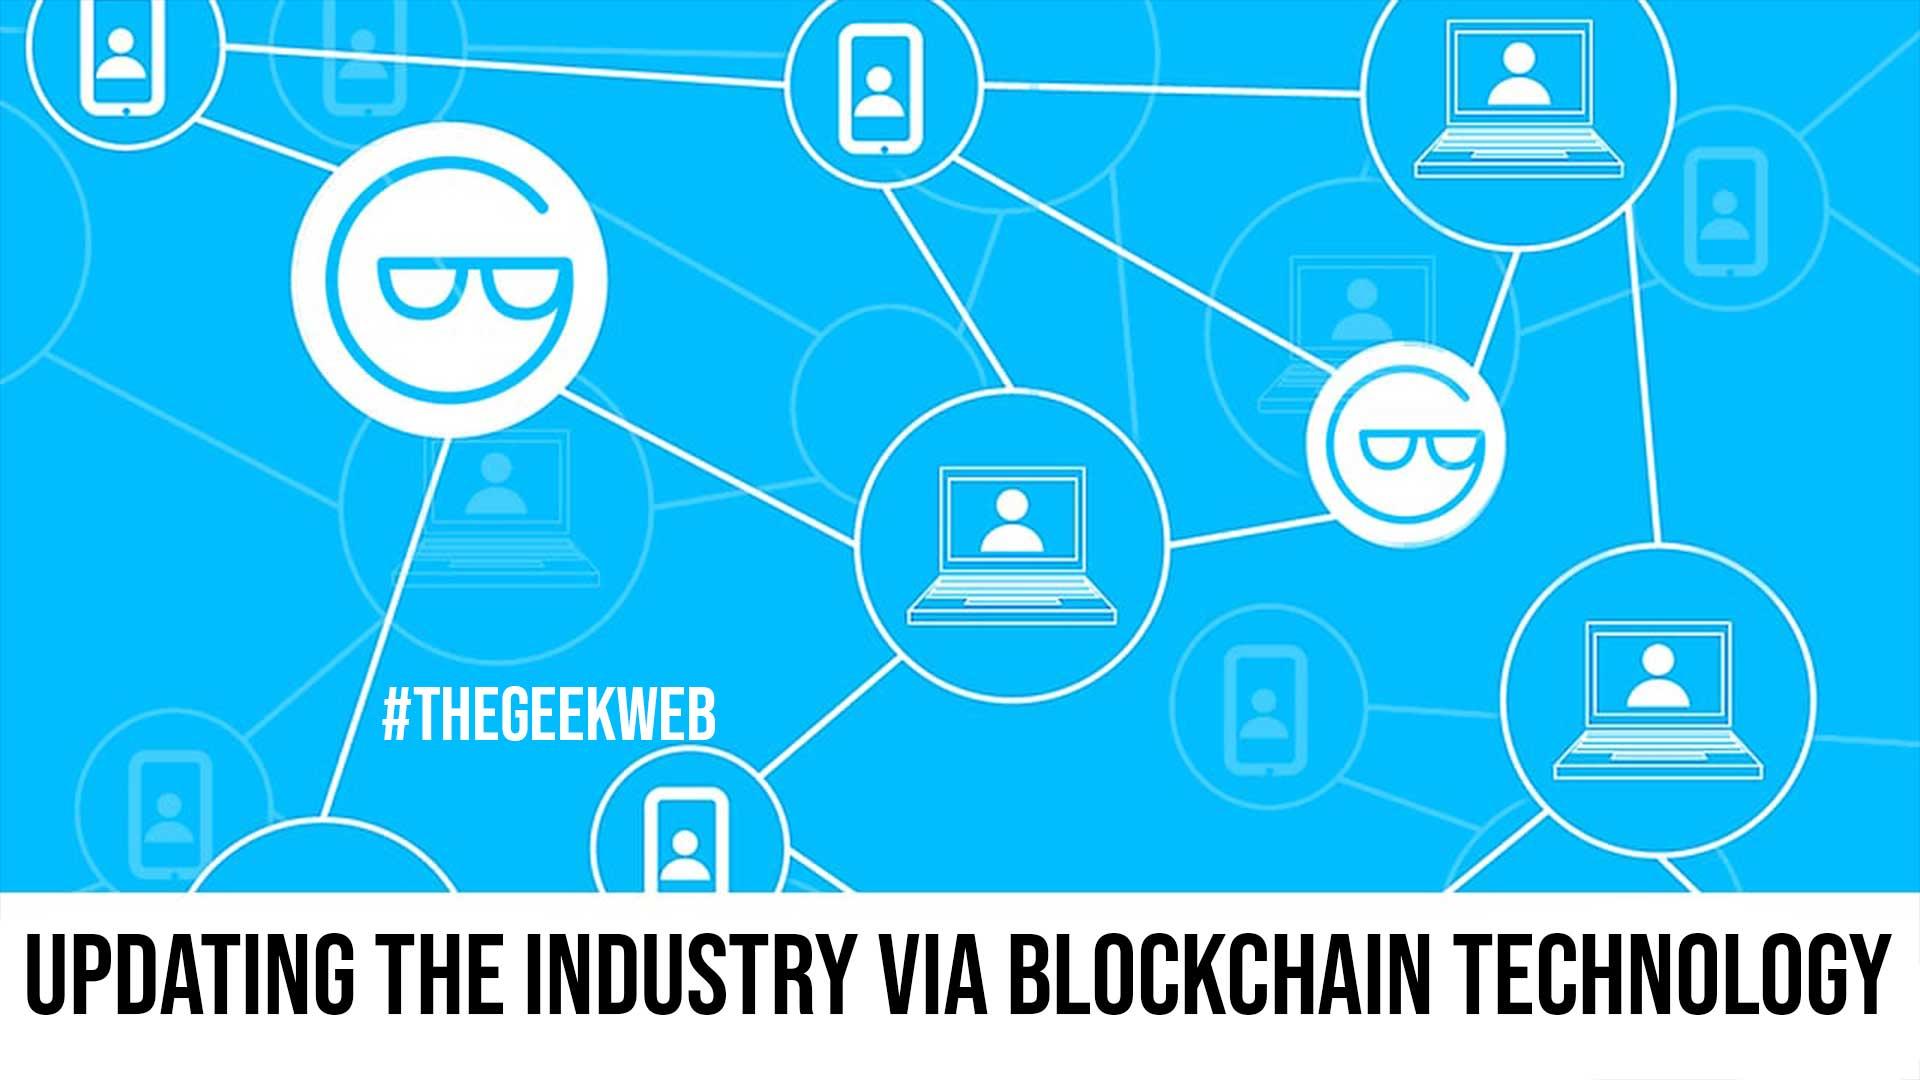 Updating the Industry via Blockchain Technology